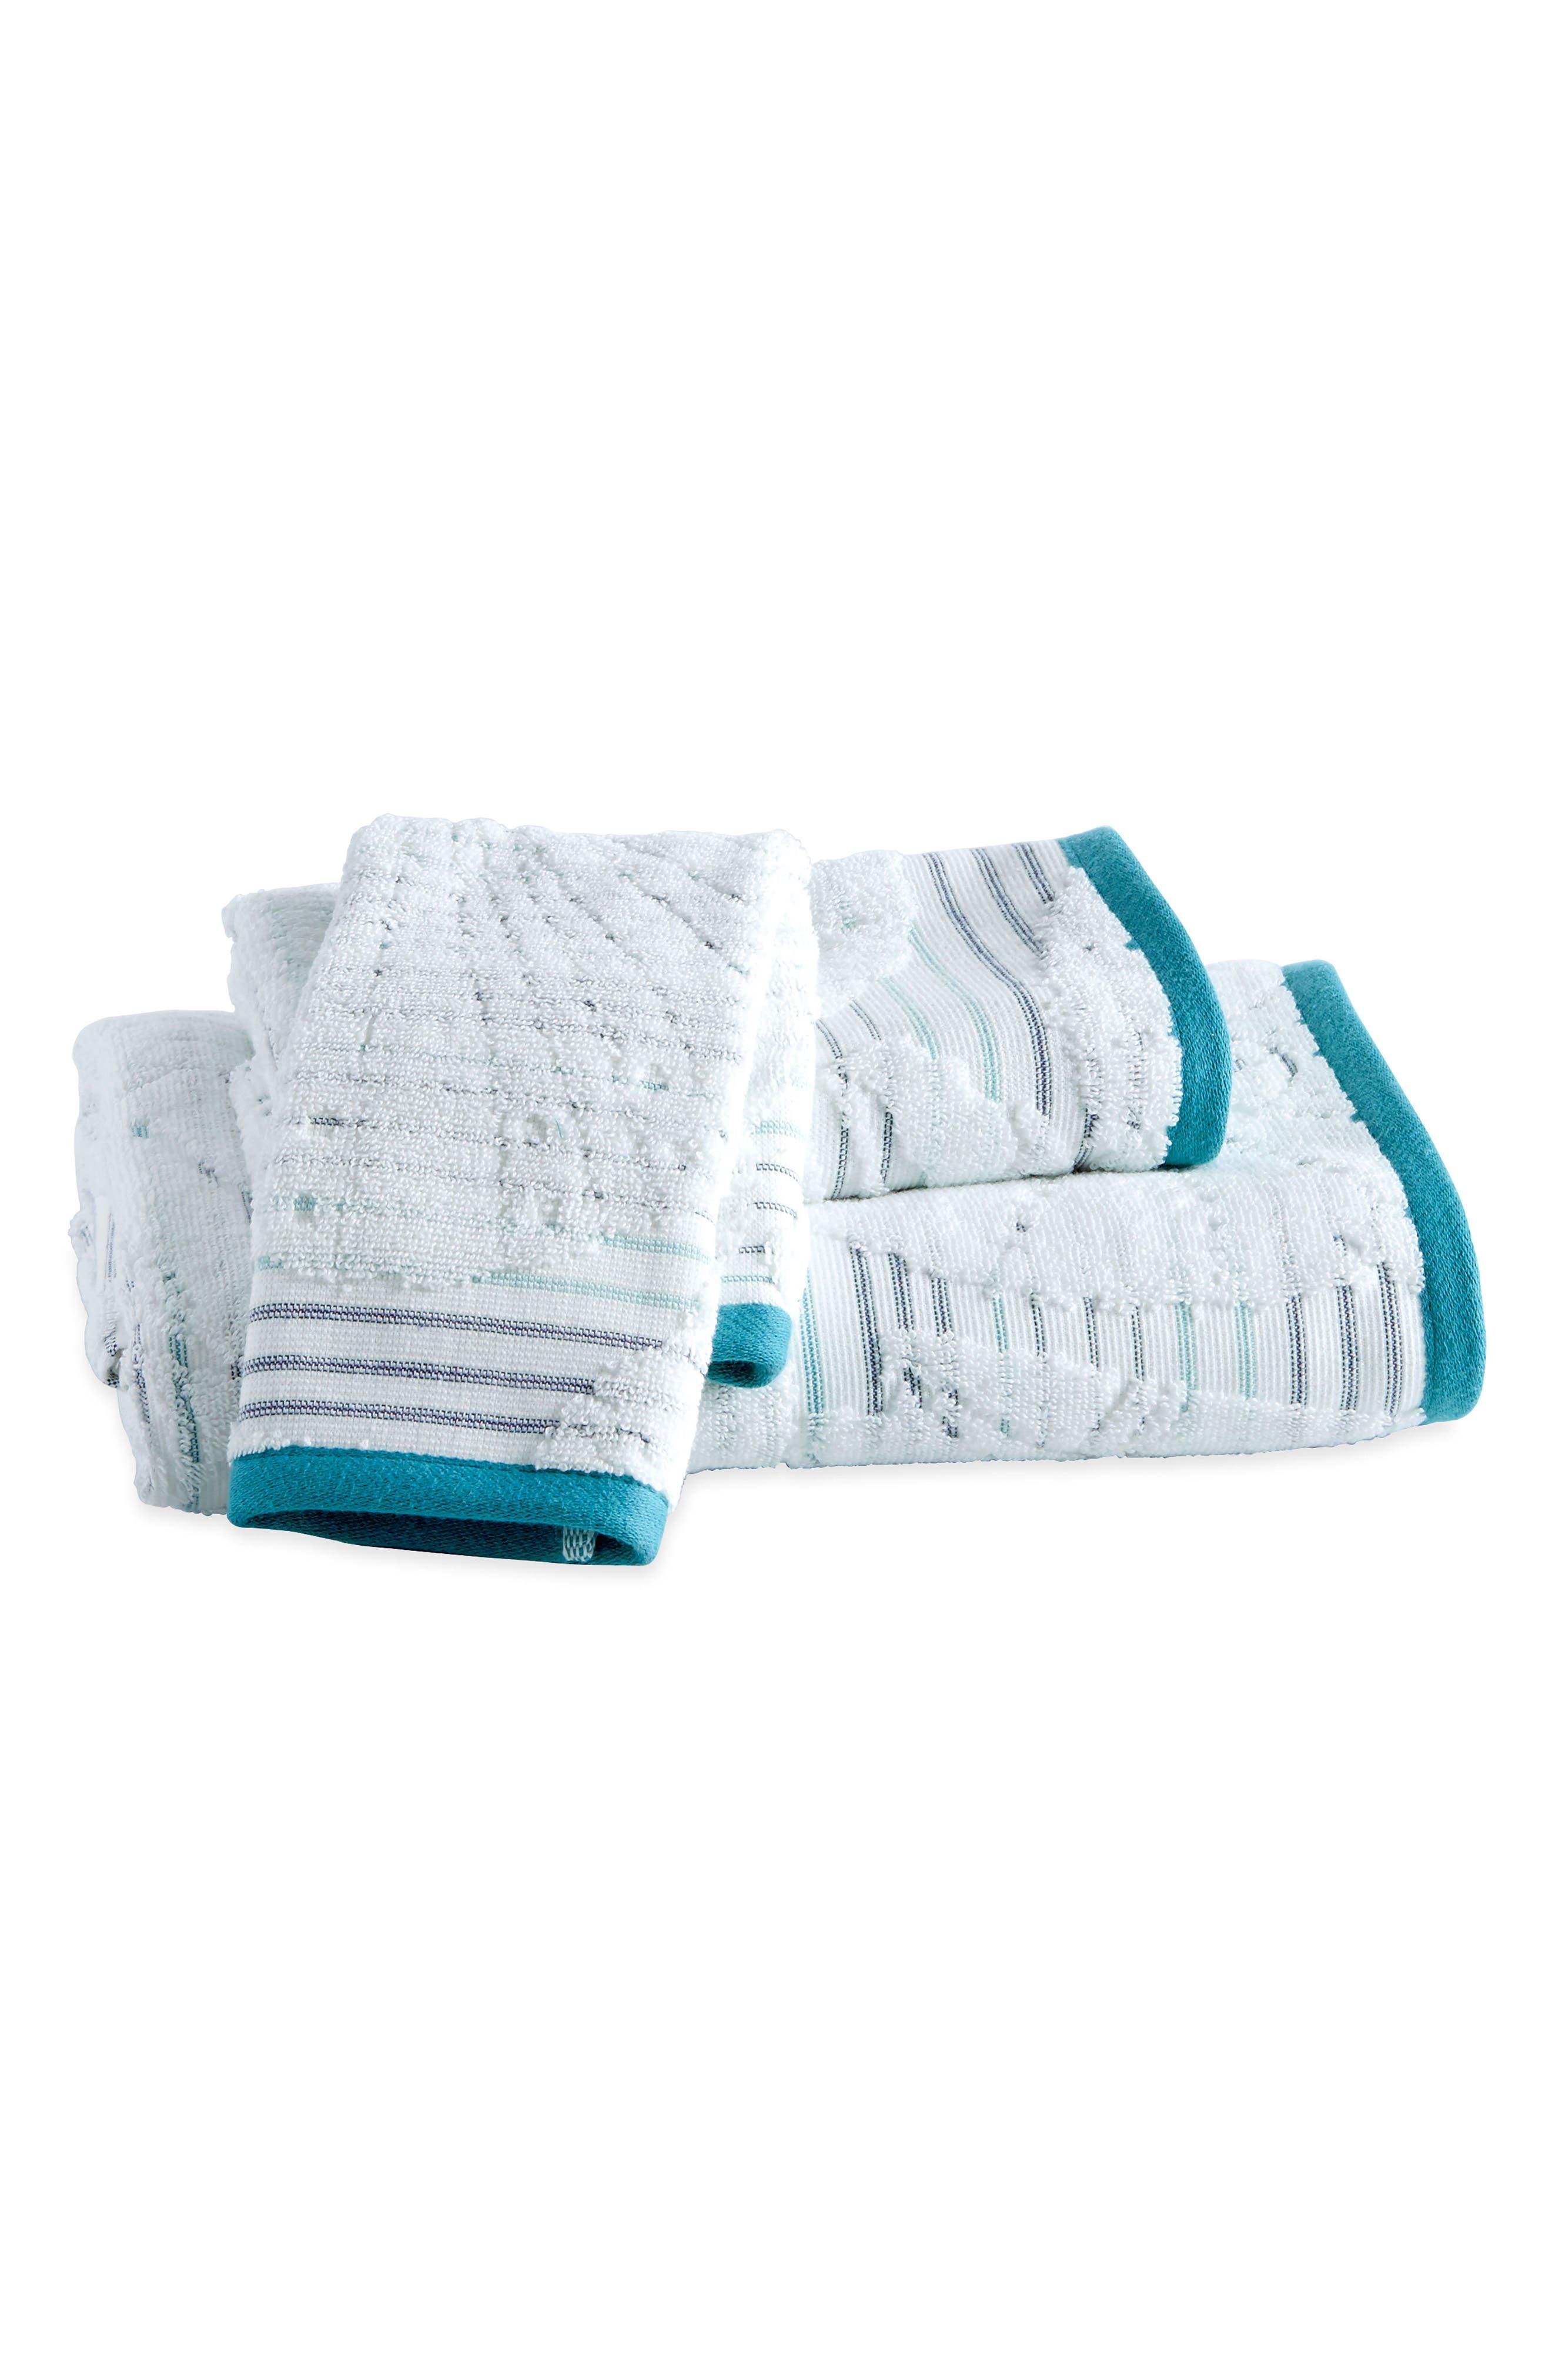 Destinations Mykonos Bath Towel, Hand Towel and Washcloth Set